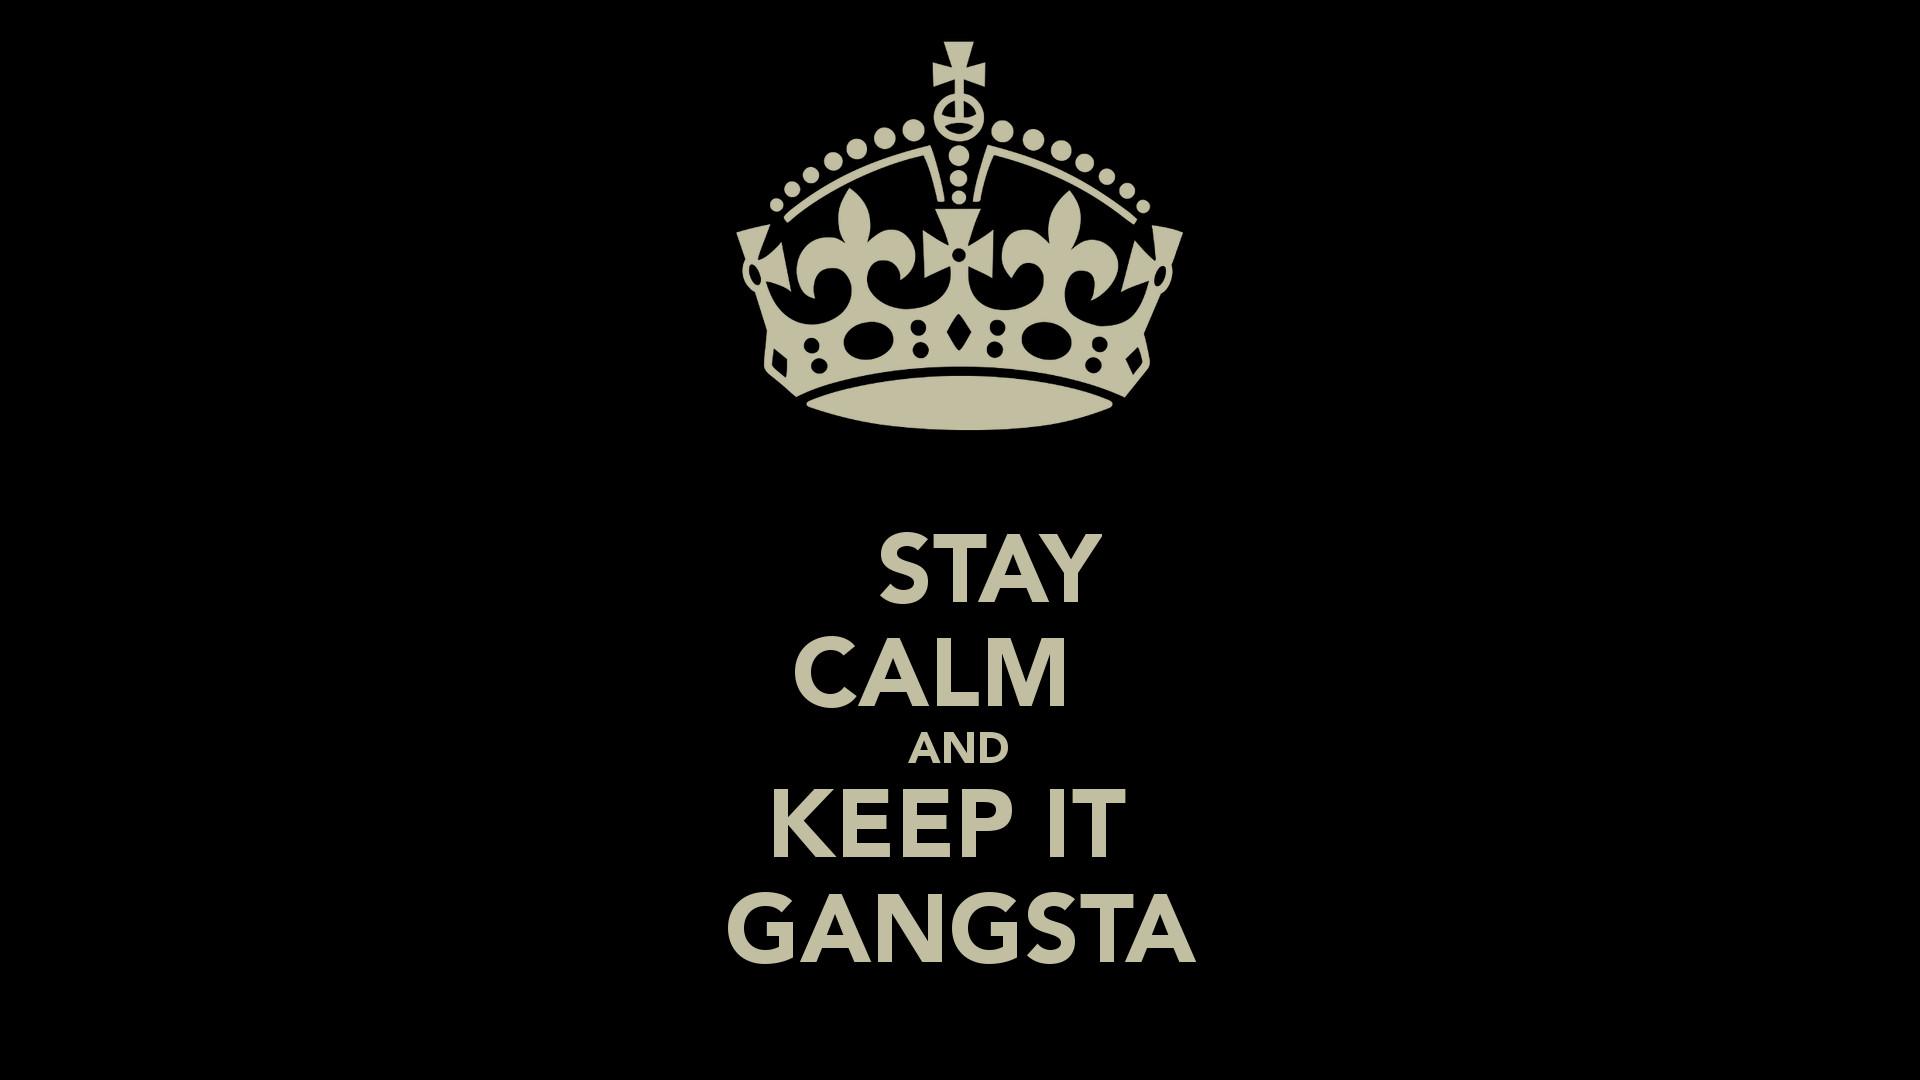 Gangster Wallpapers Wallpaper | Wallpapers 4k | Pinterest | Gangsters,  Wallpaper and 3d